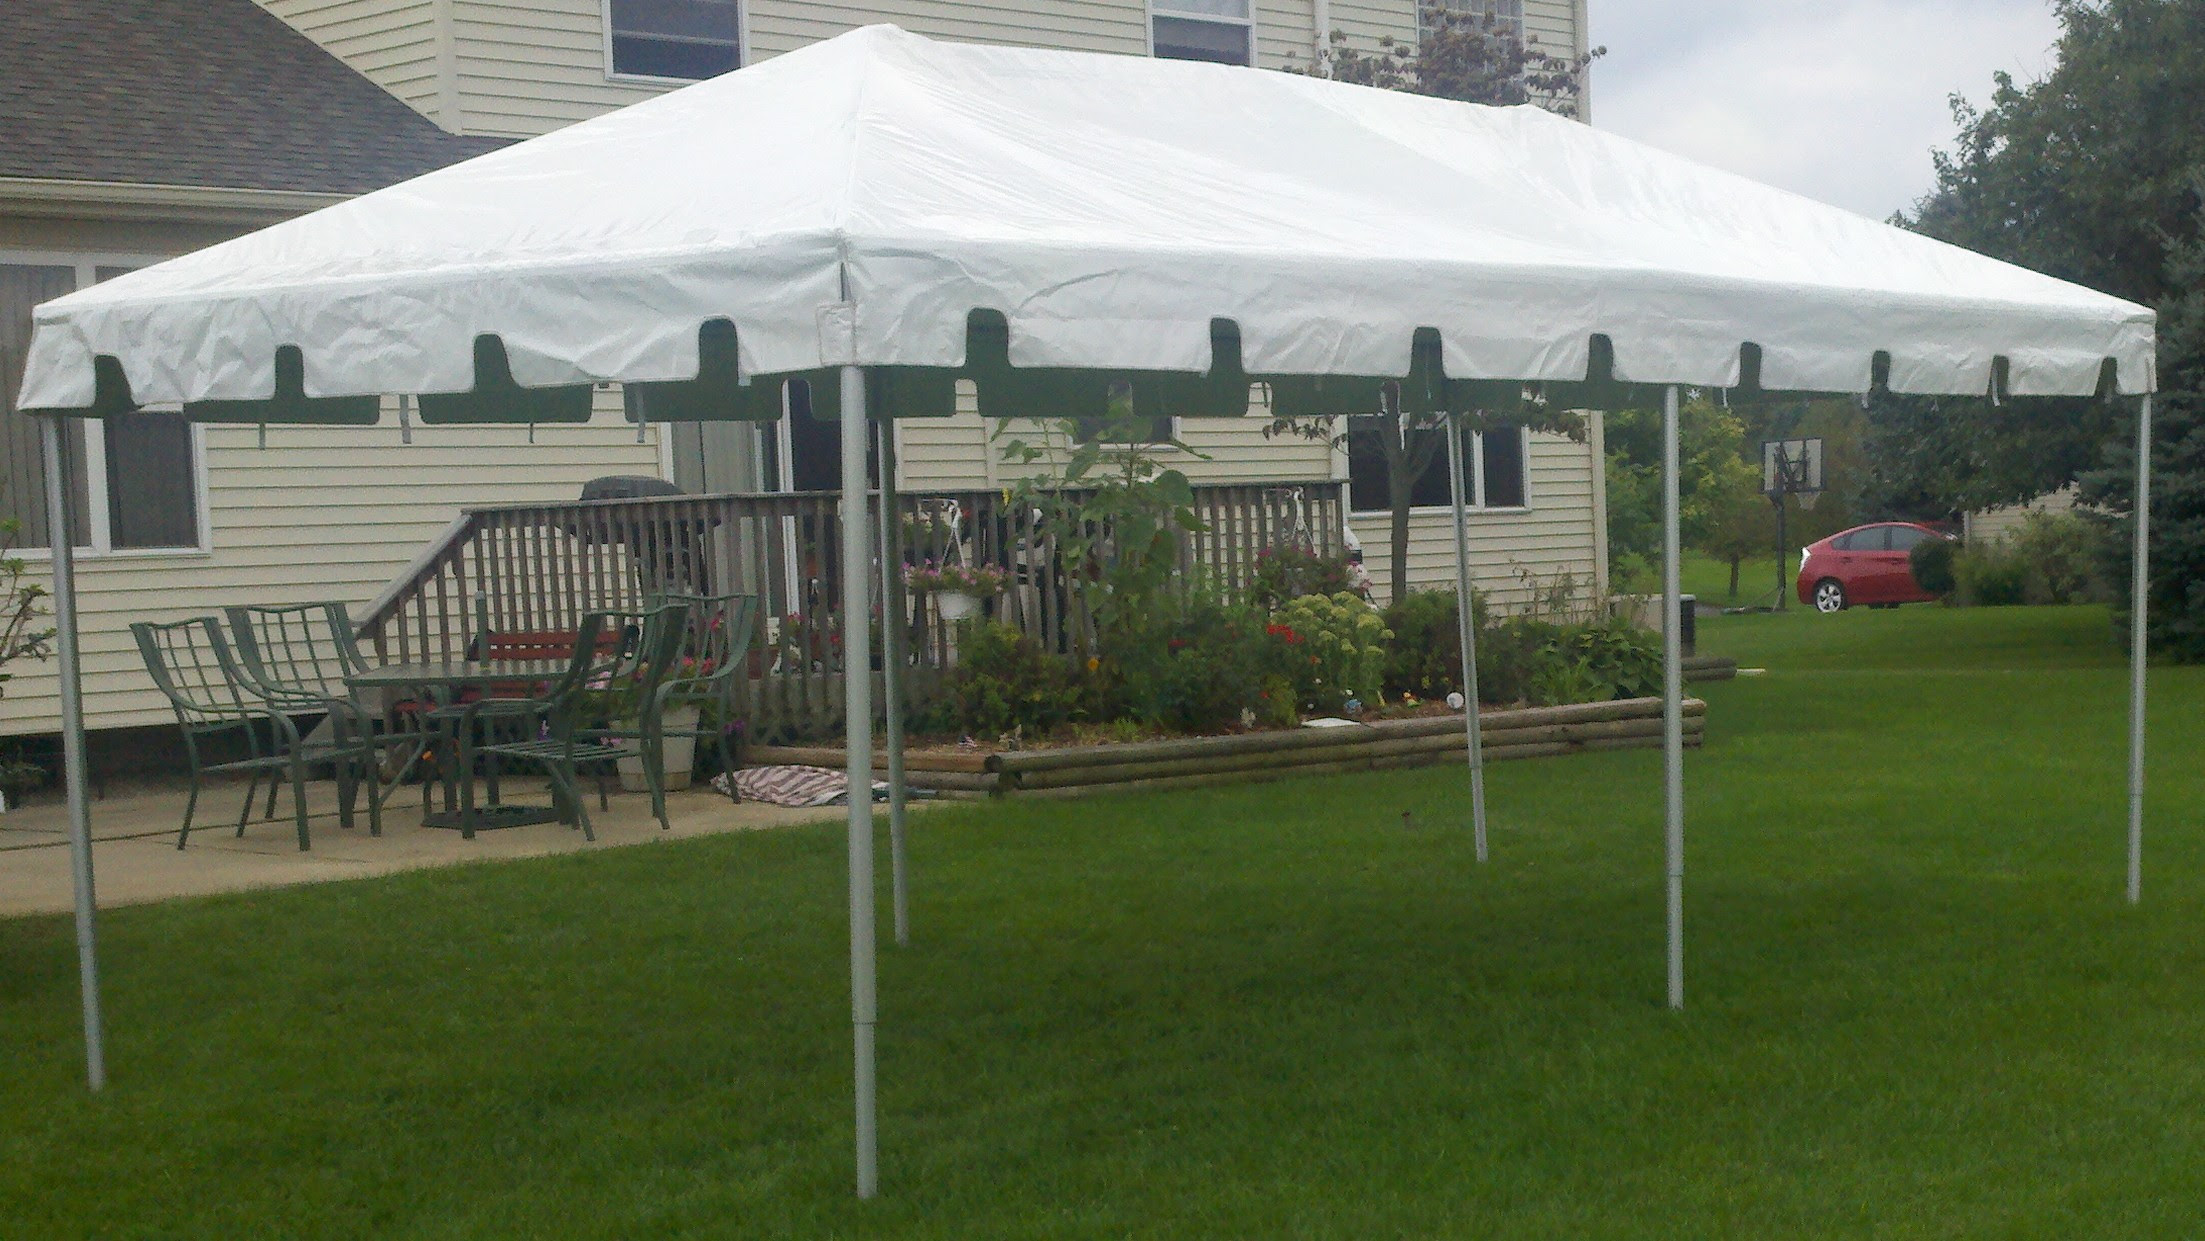 Tents Pole Tents Frame Tents Pop Up Tents